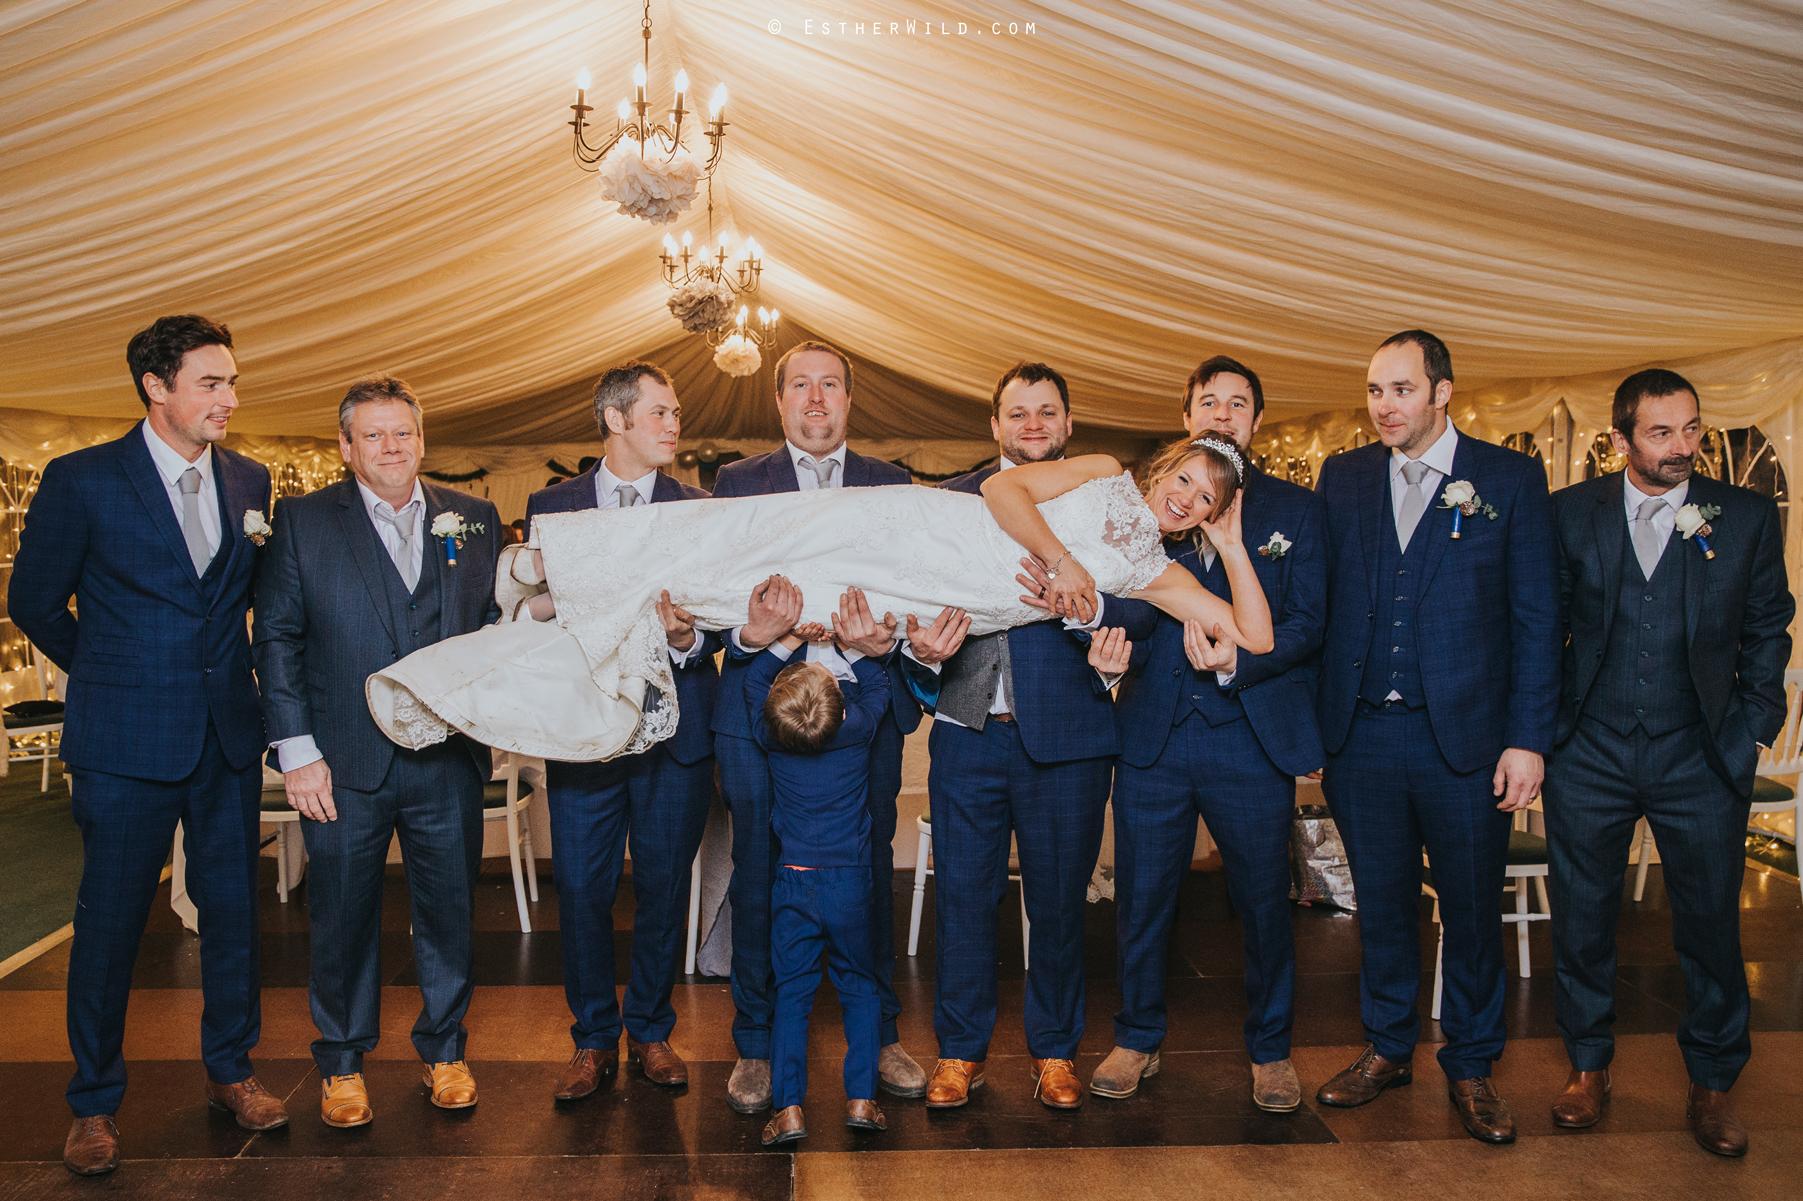 Wedding_Photography_Diss_Gawdy_Hall_Redenhall_Church_Norfolk_Winter_Esther_Wild_Copyright_IMG_2242.jpg